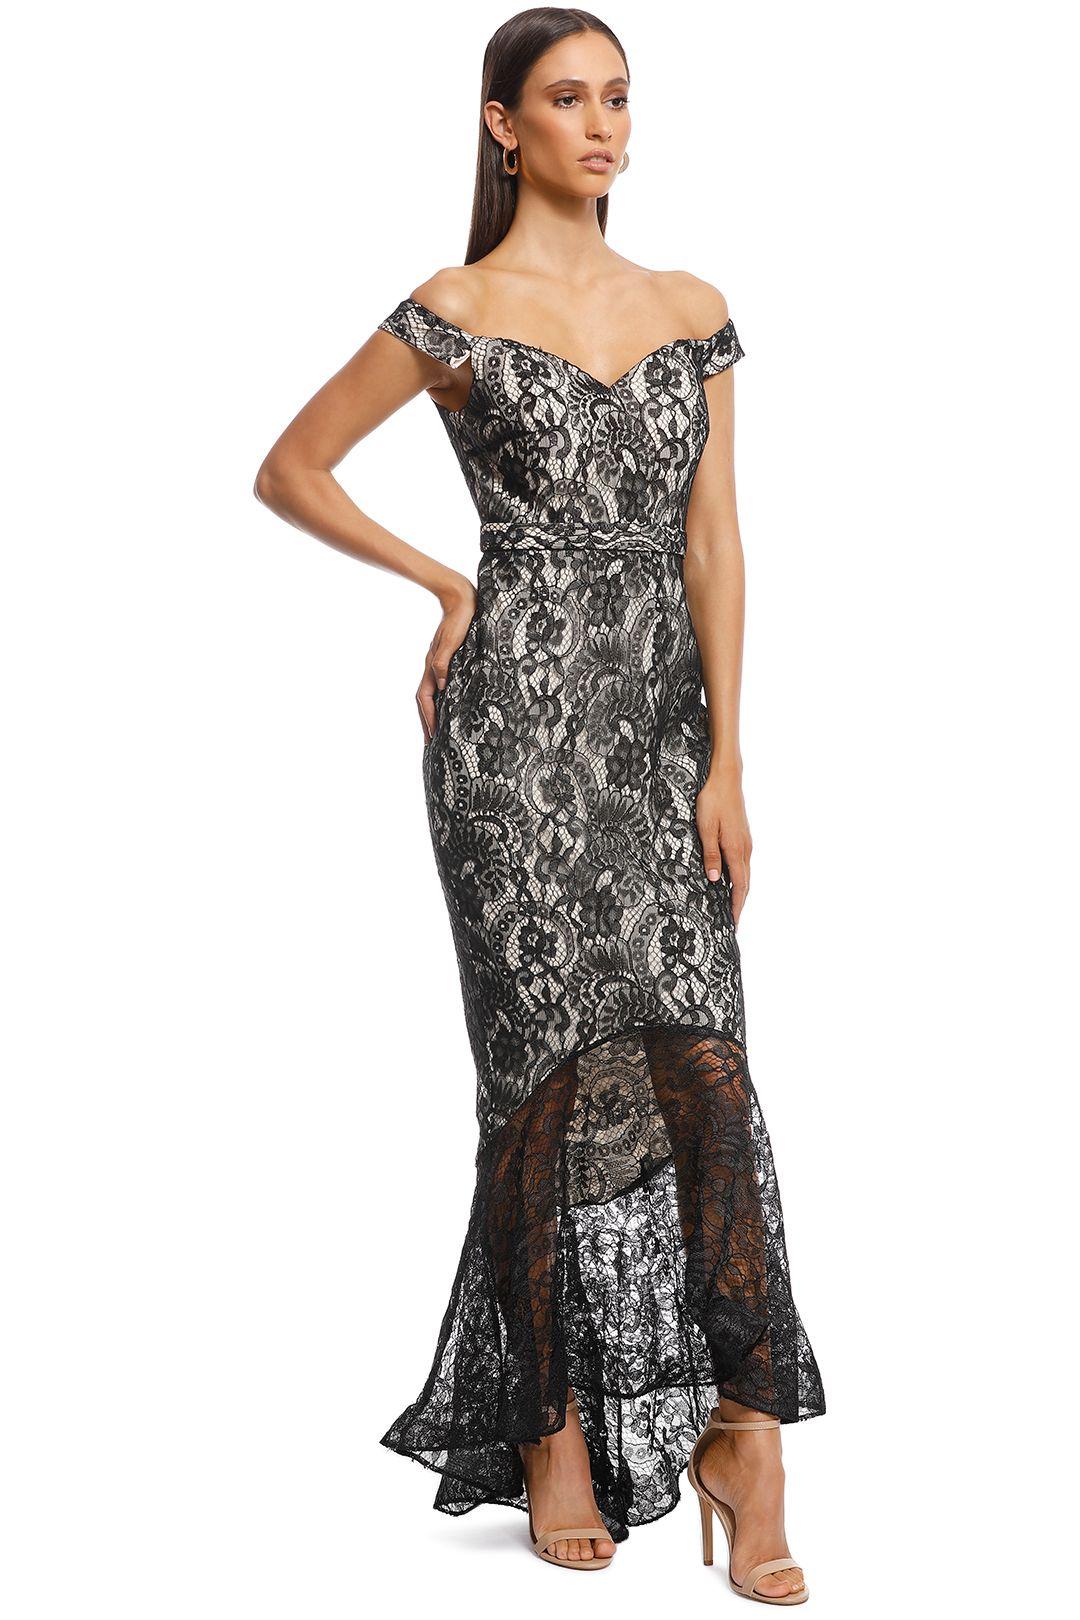 Jadore - Candy Dress - Black - Side